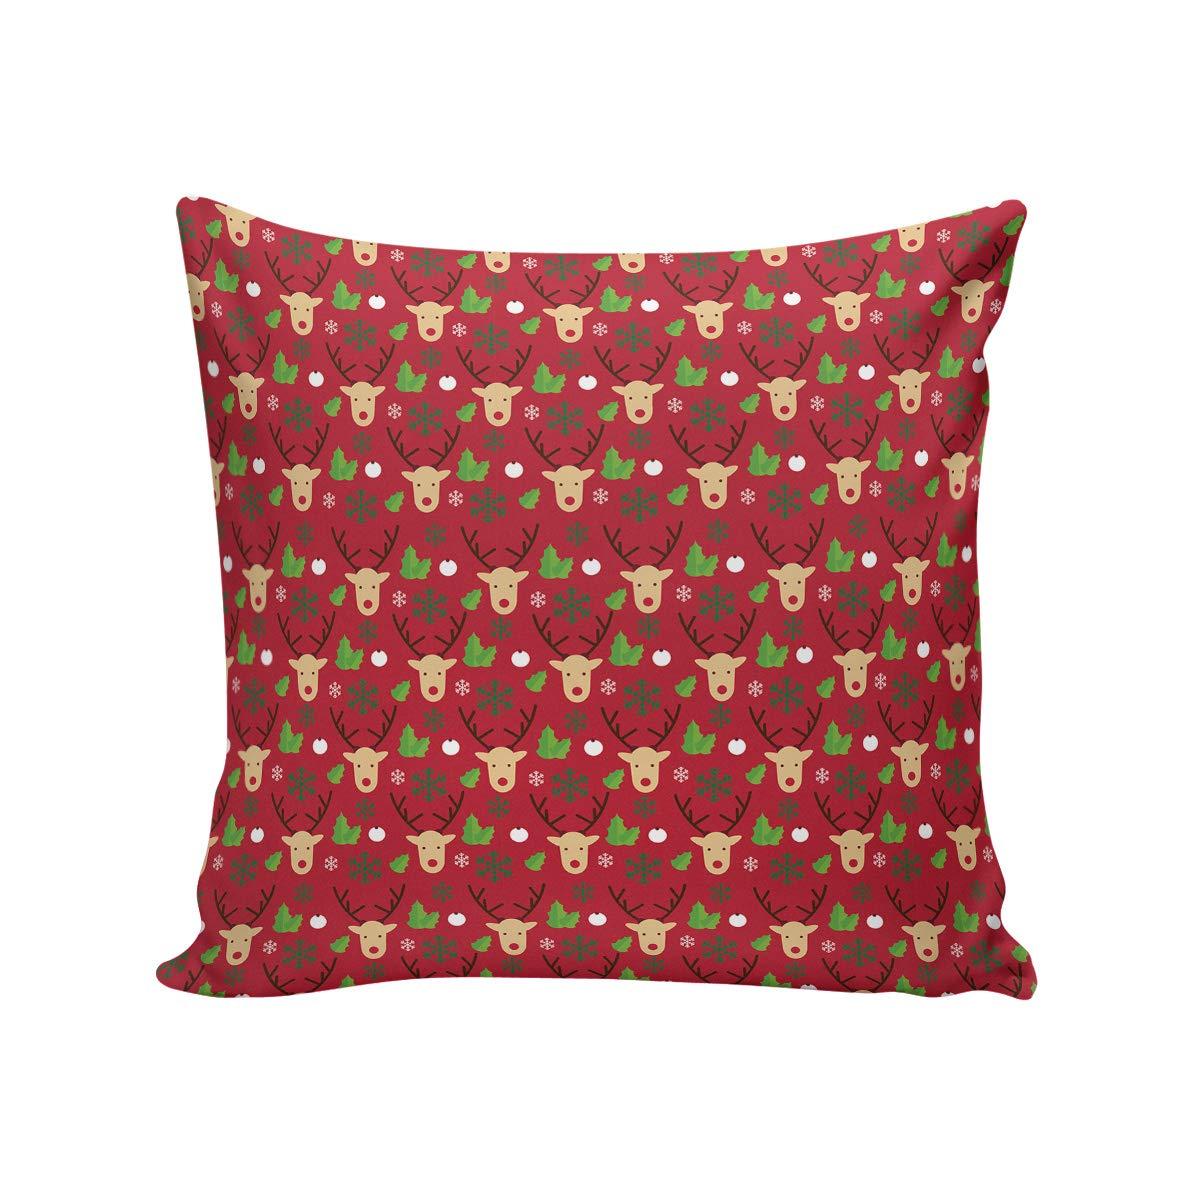 CHARMHOME クリスマステーマ クッションカバー ホームデコレーション ソフト 正方形 クリスマスシリーズ クッションカバー 24インチ x 24インチ コットンリネン   B07JYCFHJ1